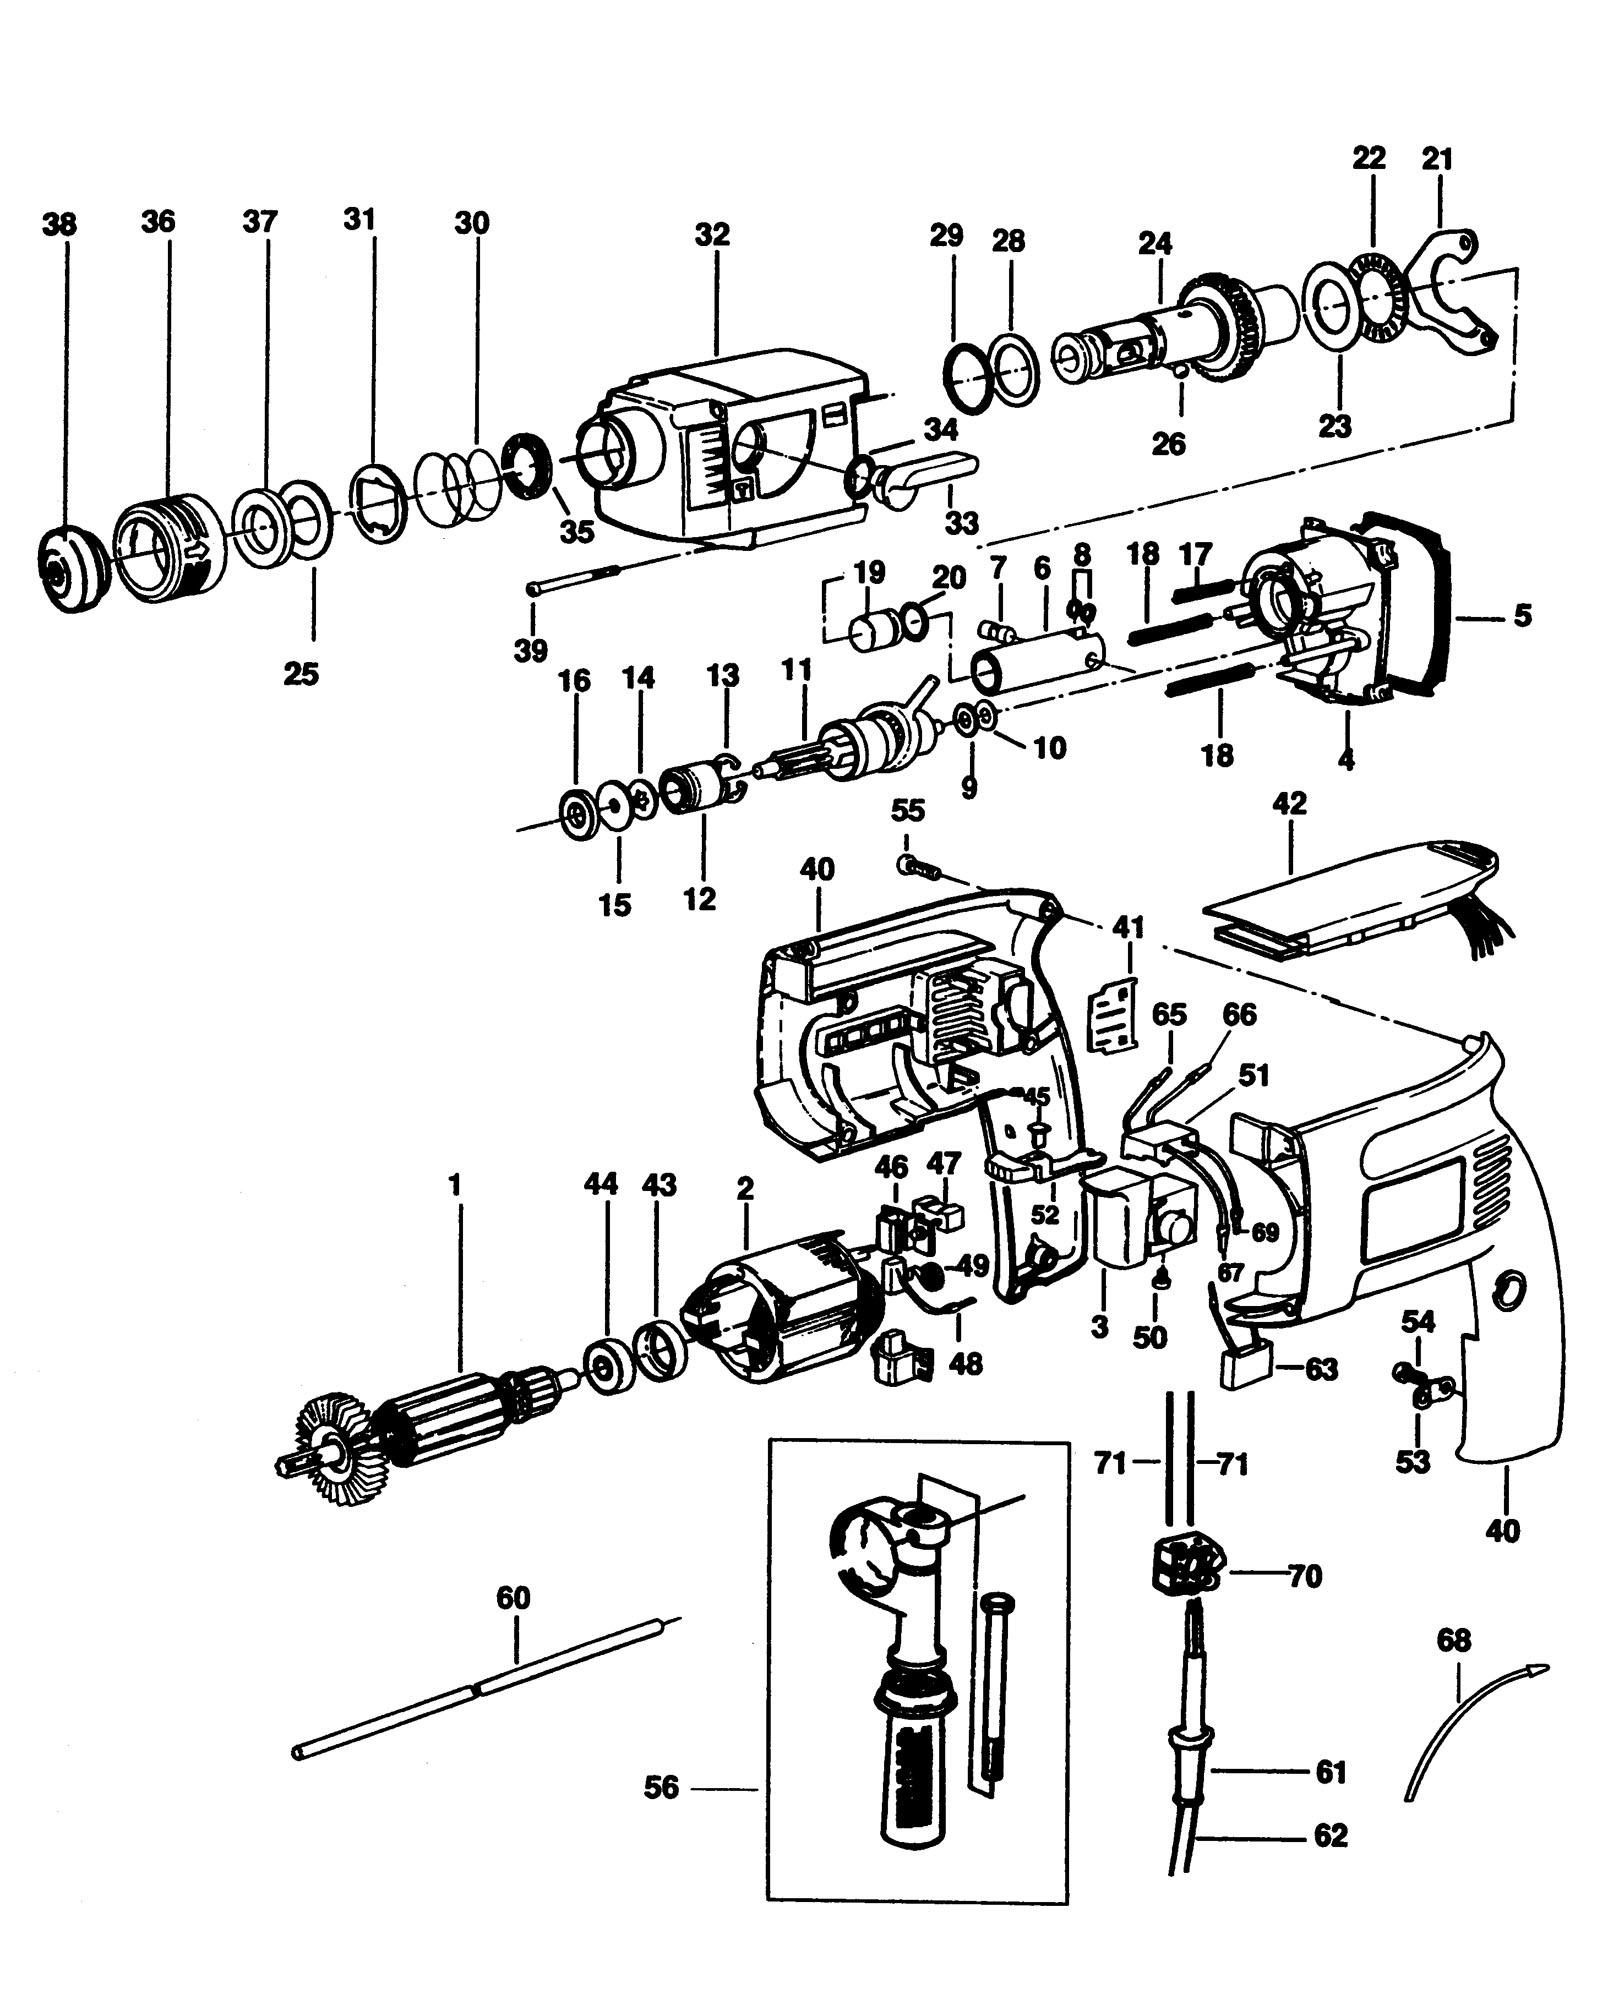 Rotary Switch Kits